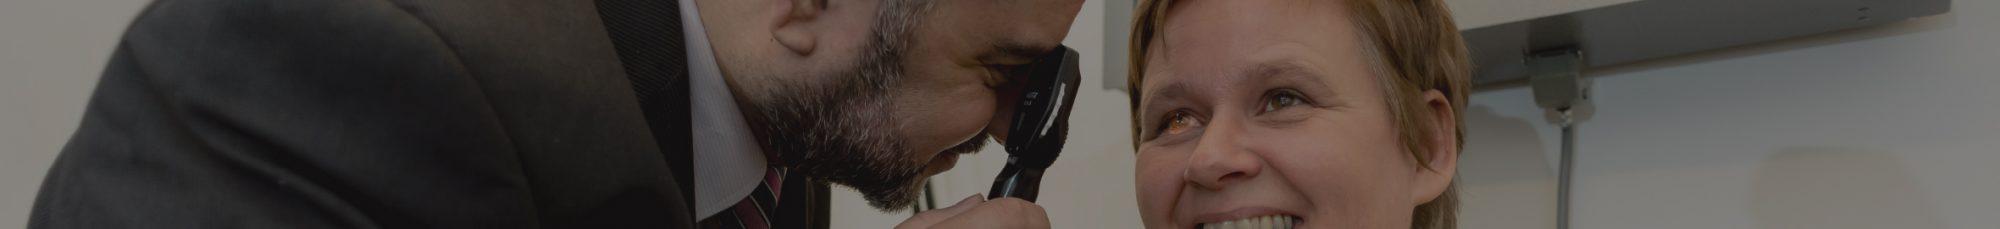 Enhanced eye examinations